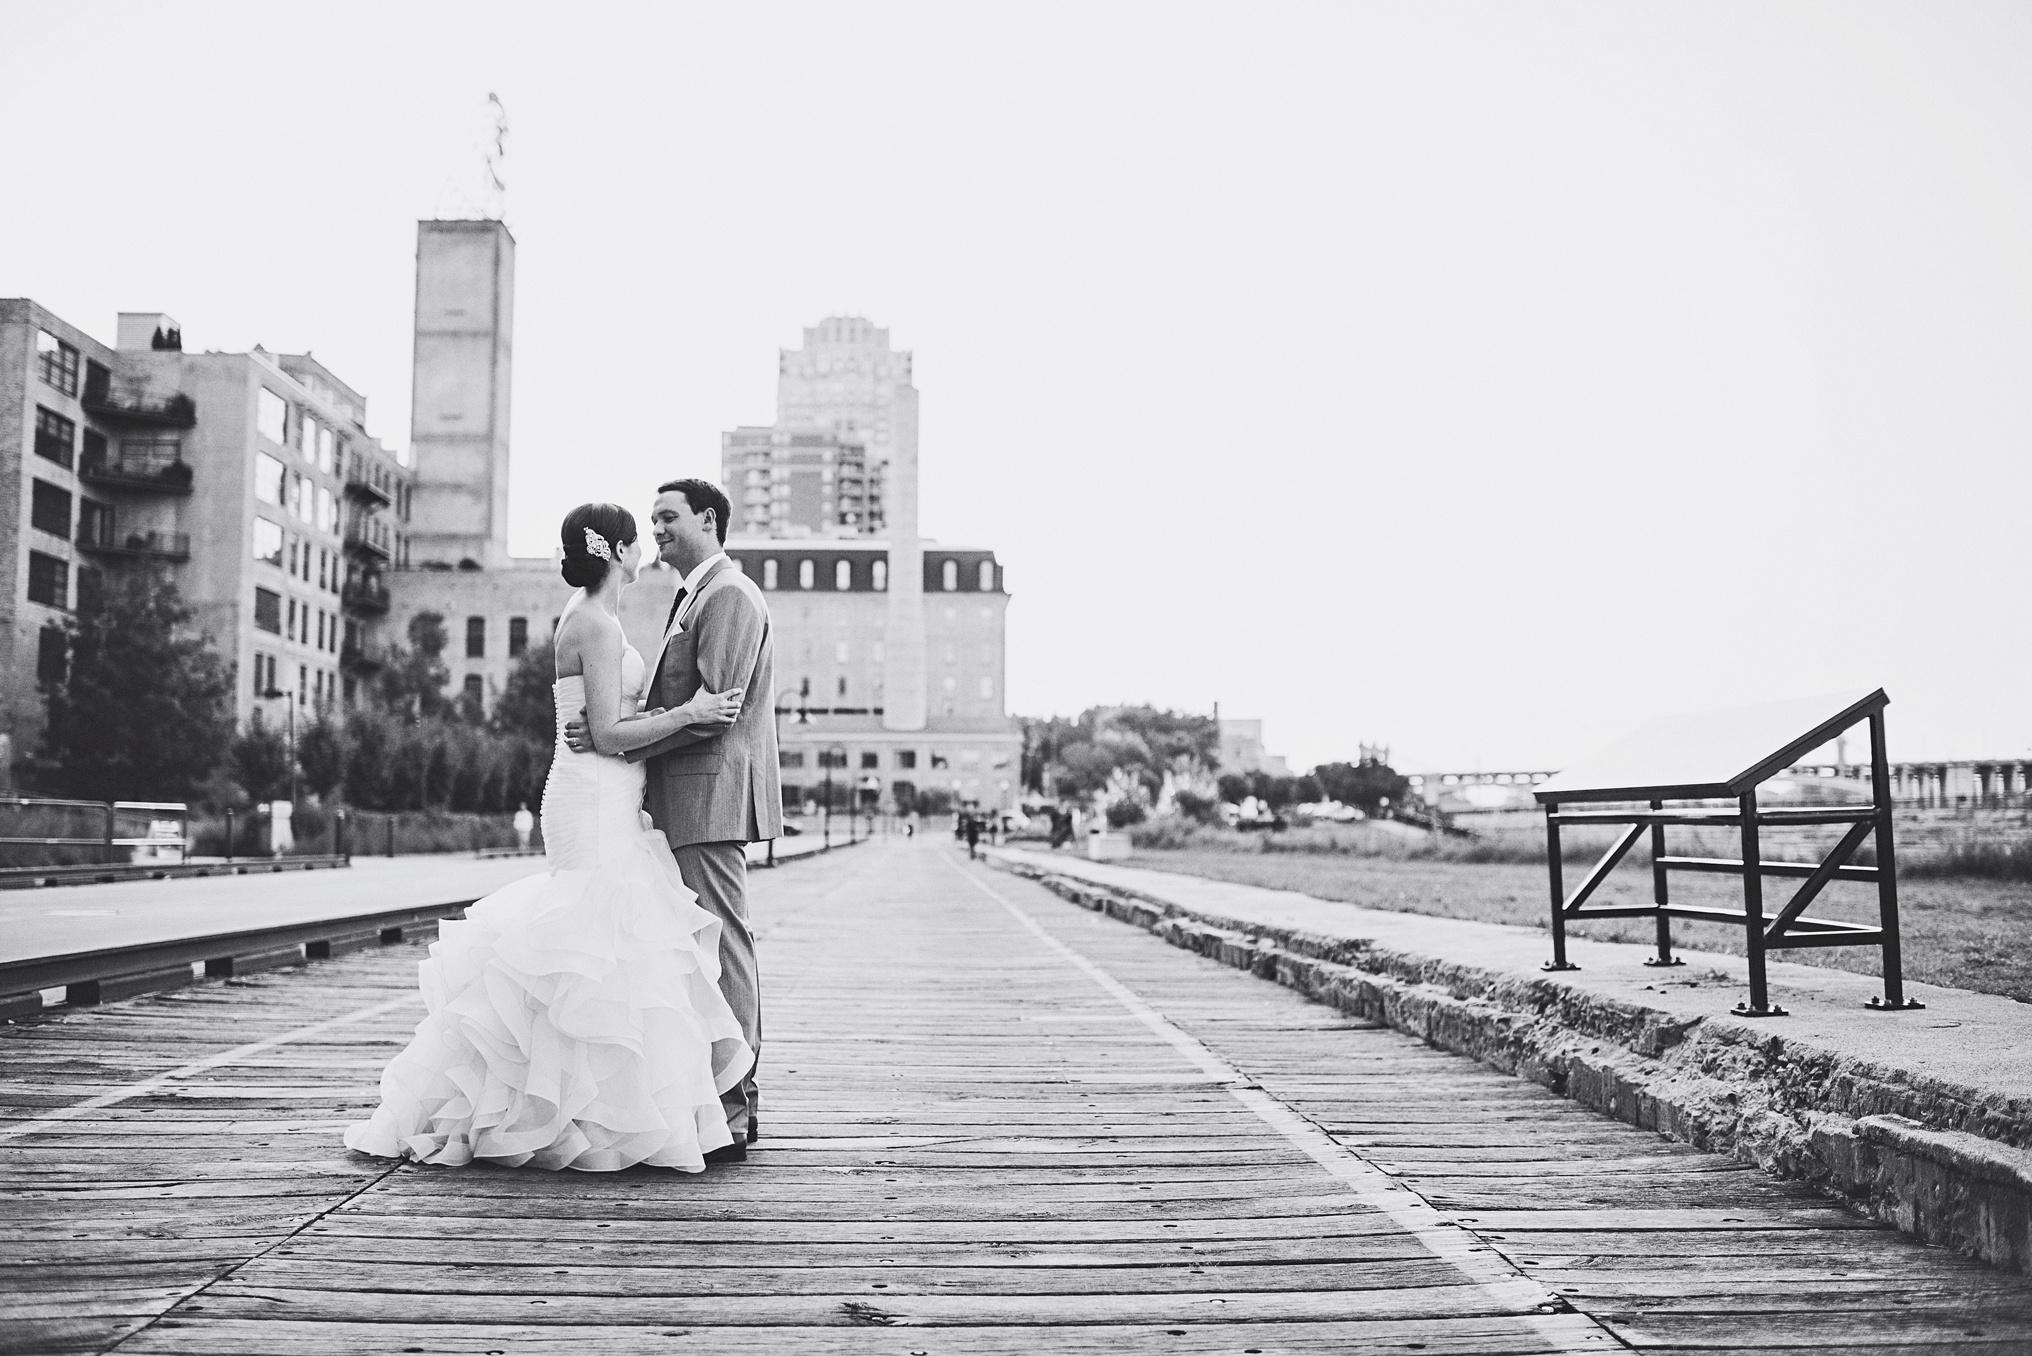 best_wedding_photography_2017_by_lucas_botz_photography_190.jpg